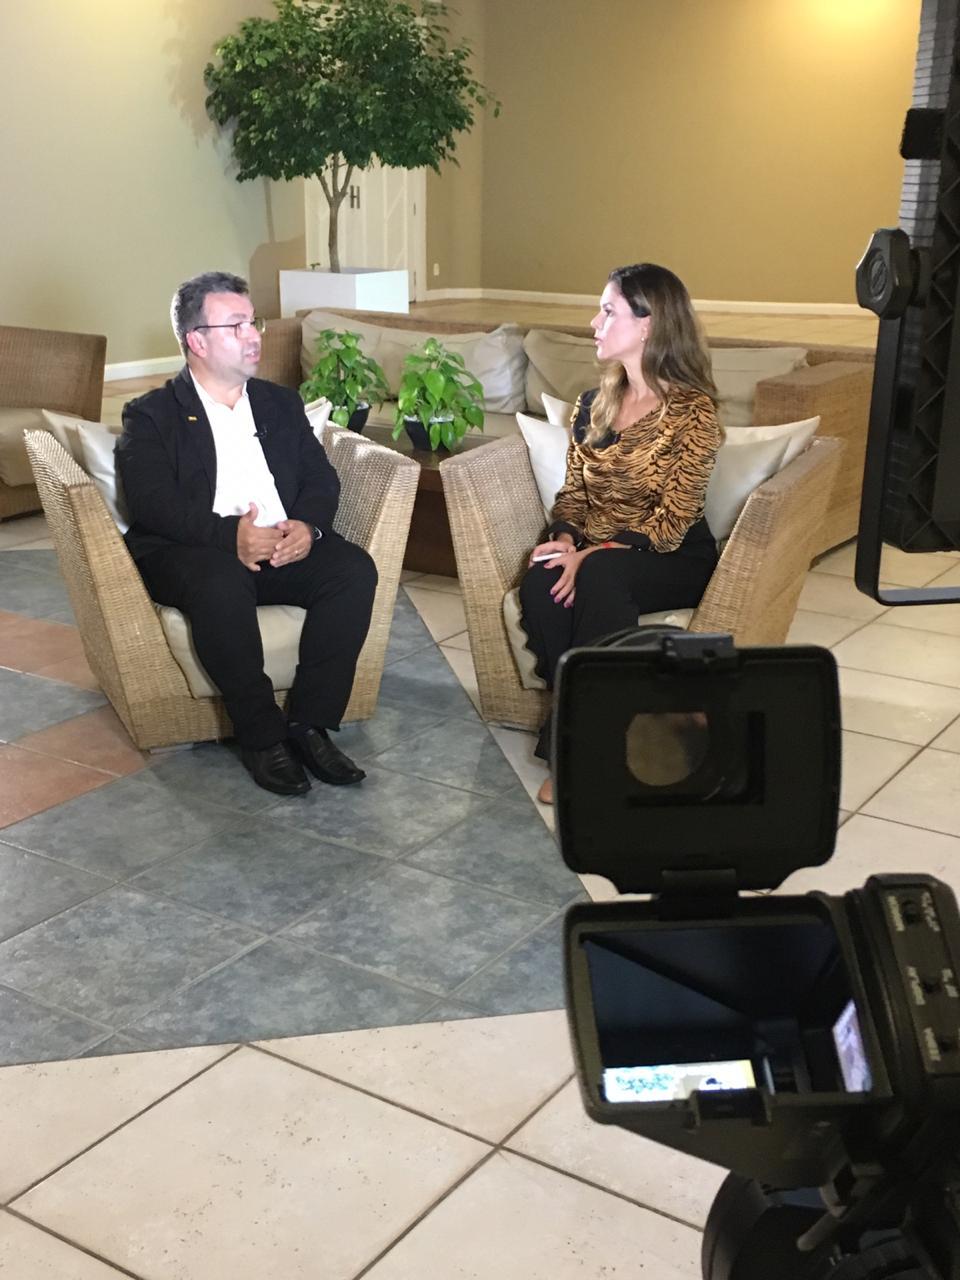 TV Escola exibe, nesta sexta-feira (23), entrevista com o novo presidente da Undime